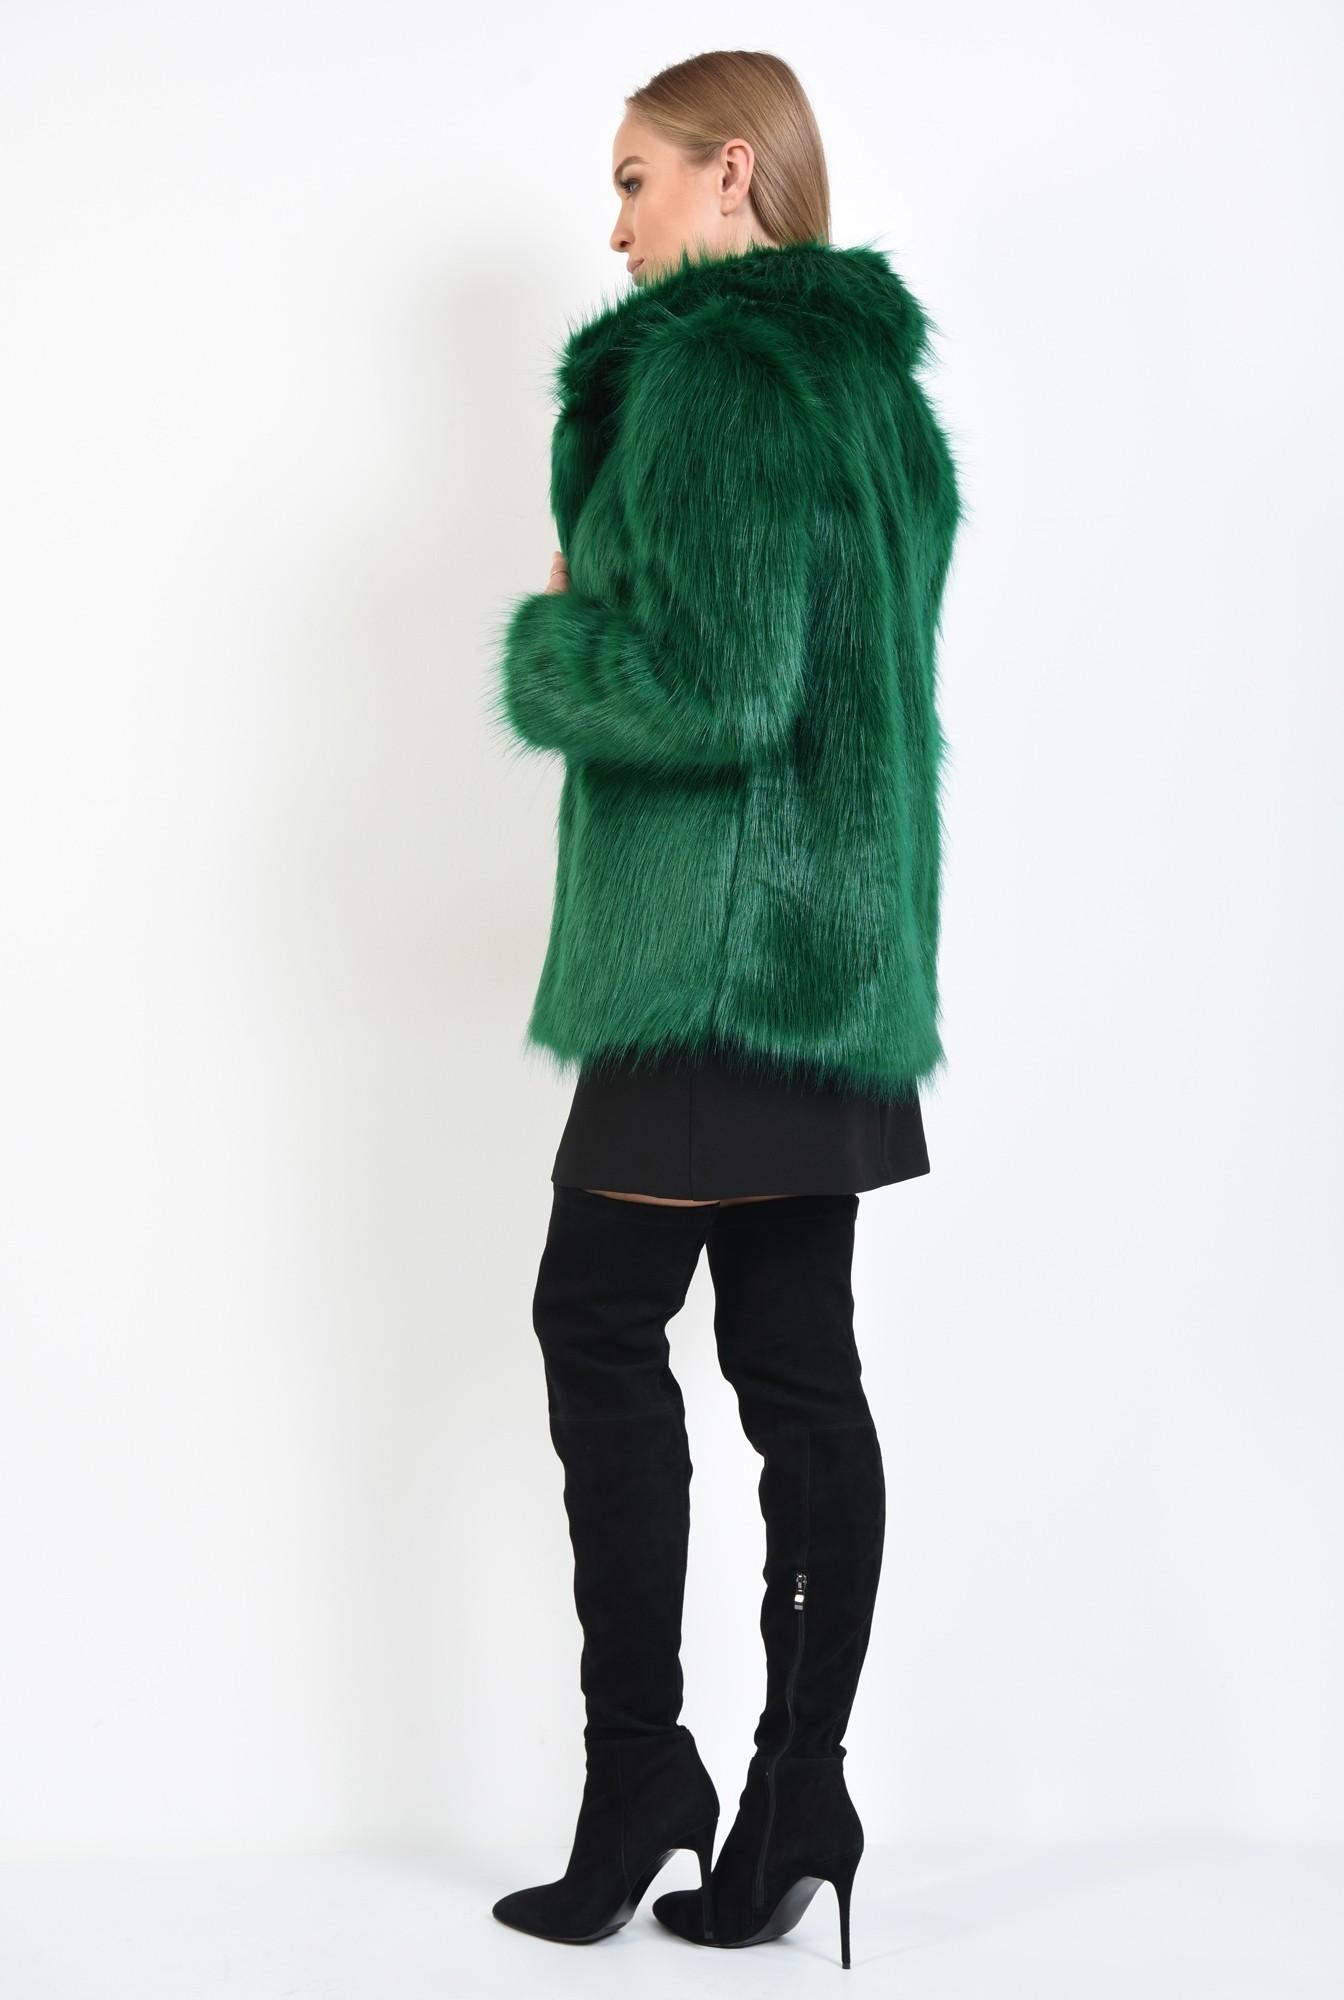 1 - haina din blana ecologica, dreapta, guler cu revere, verde